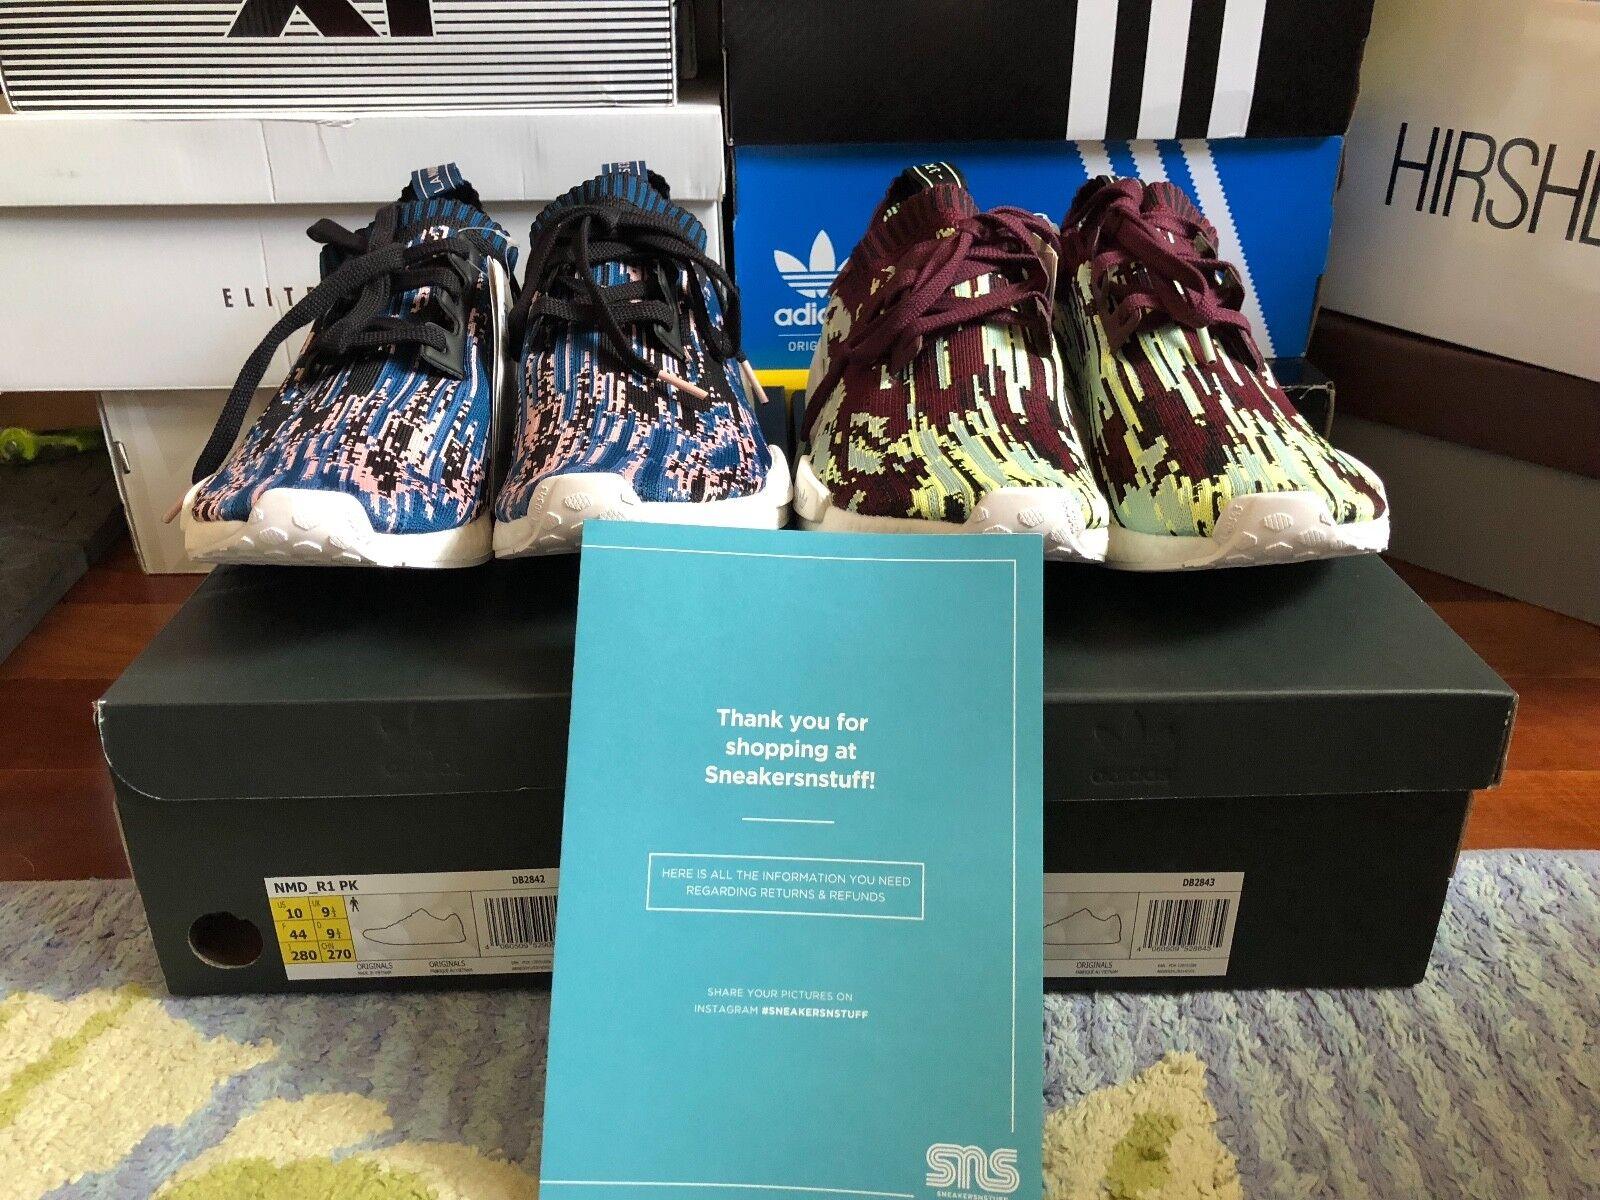 Zwei sns x adidas nmd r1 pk datamosh 2.0 pack - größe 10 (beide colorways)